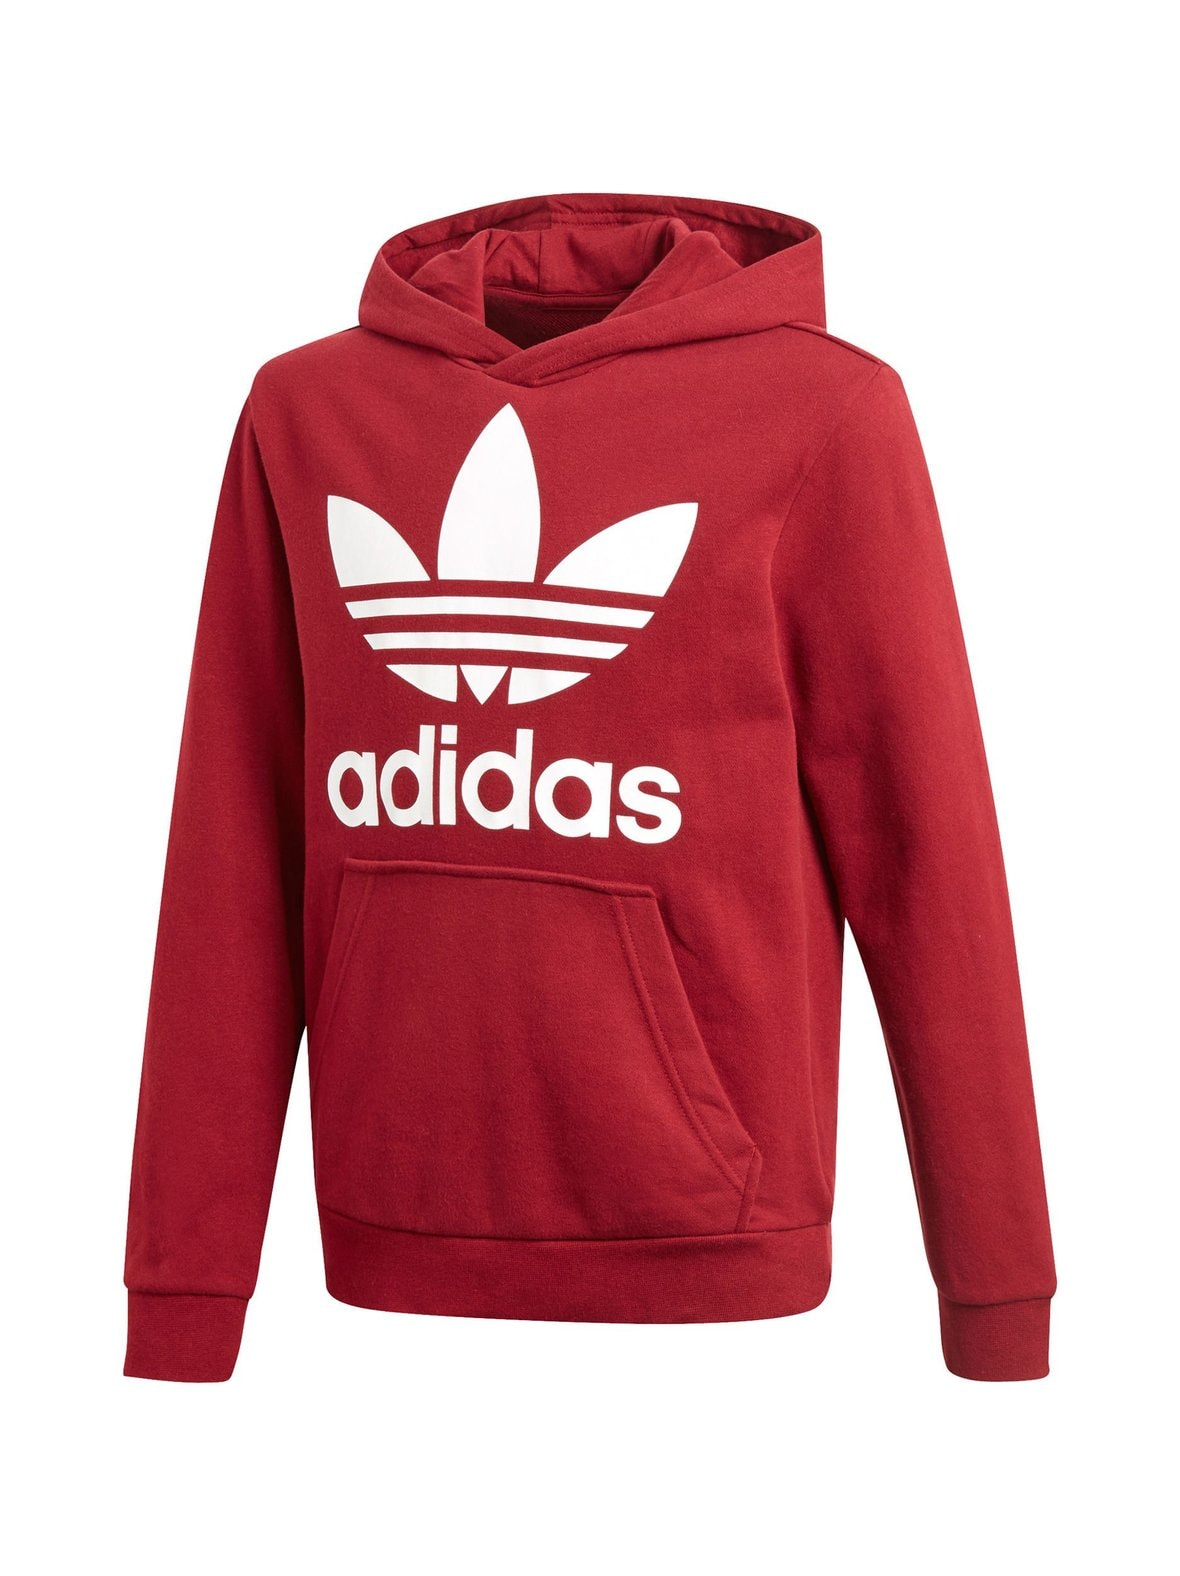 Burgundy (punainen) Adidas Originals Trefoil-huppari CD6501  71bd18cb56